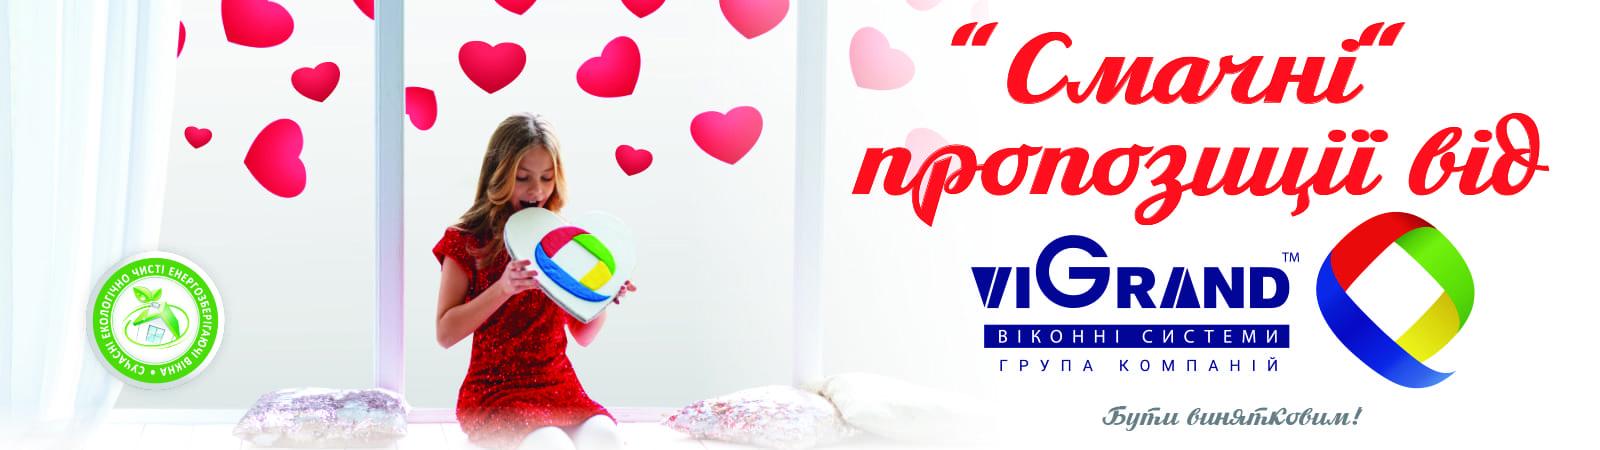 banner vkys ukr - Головна